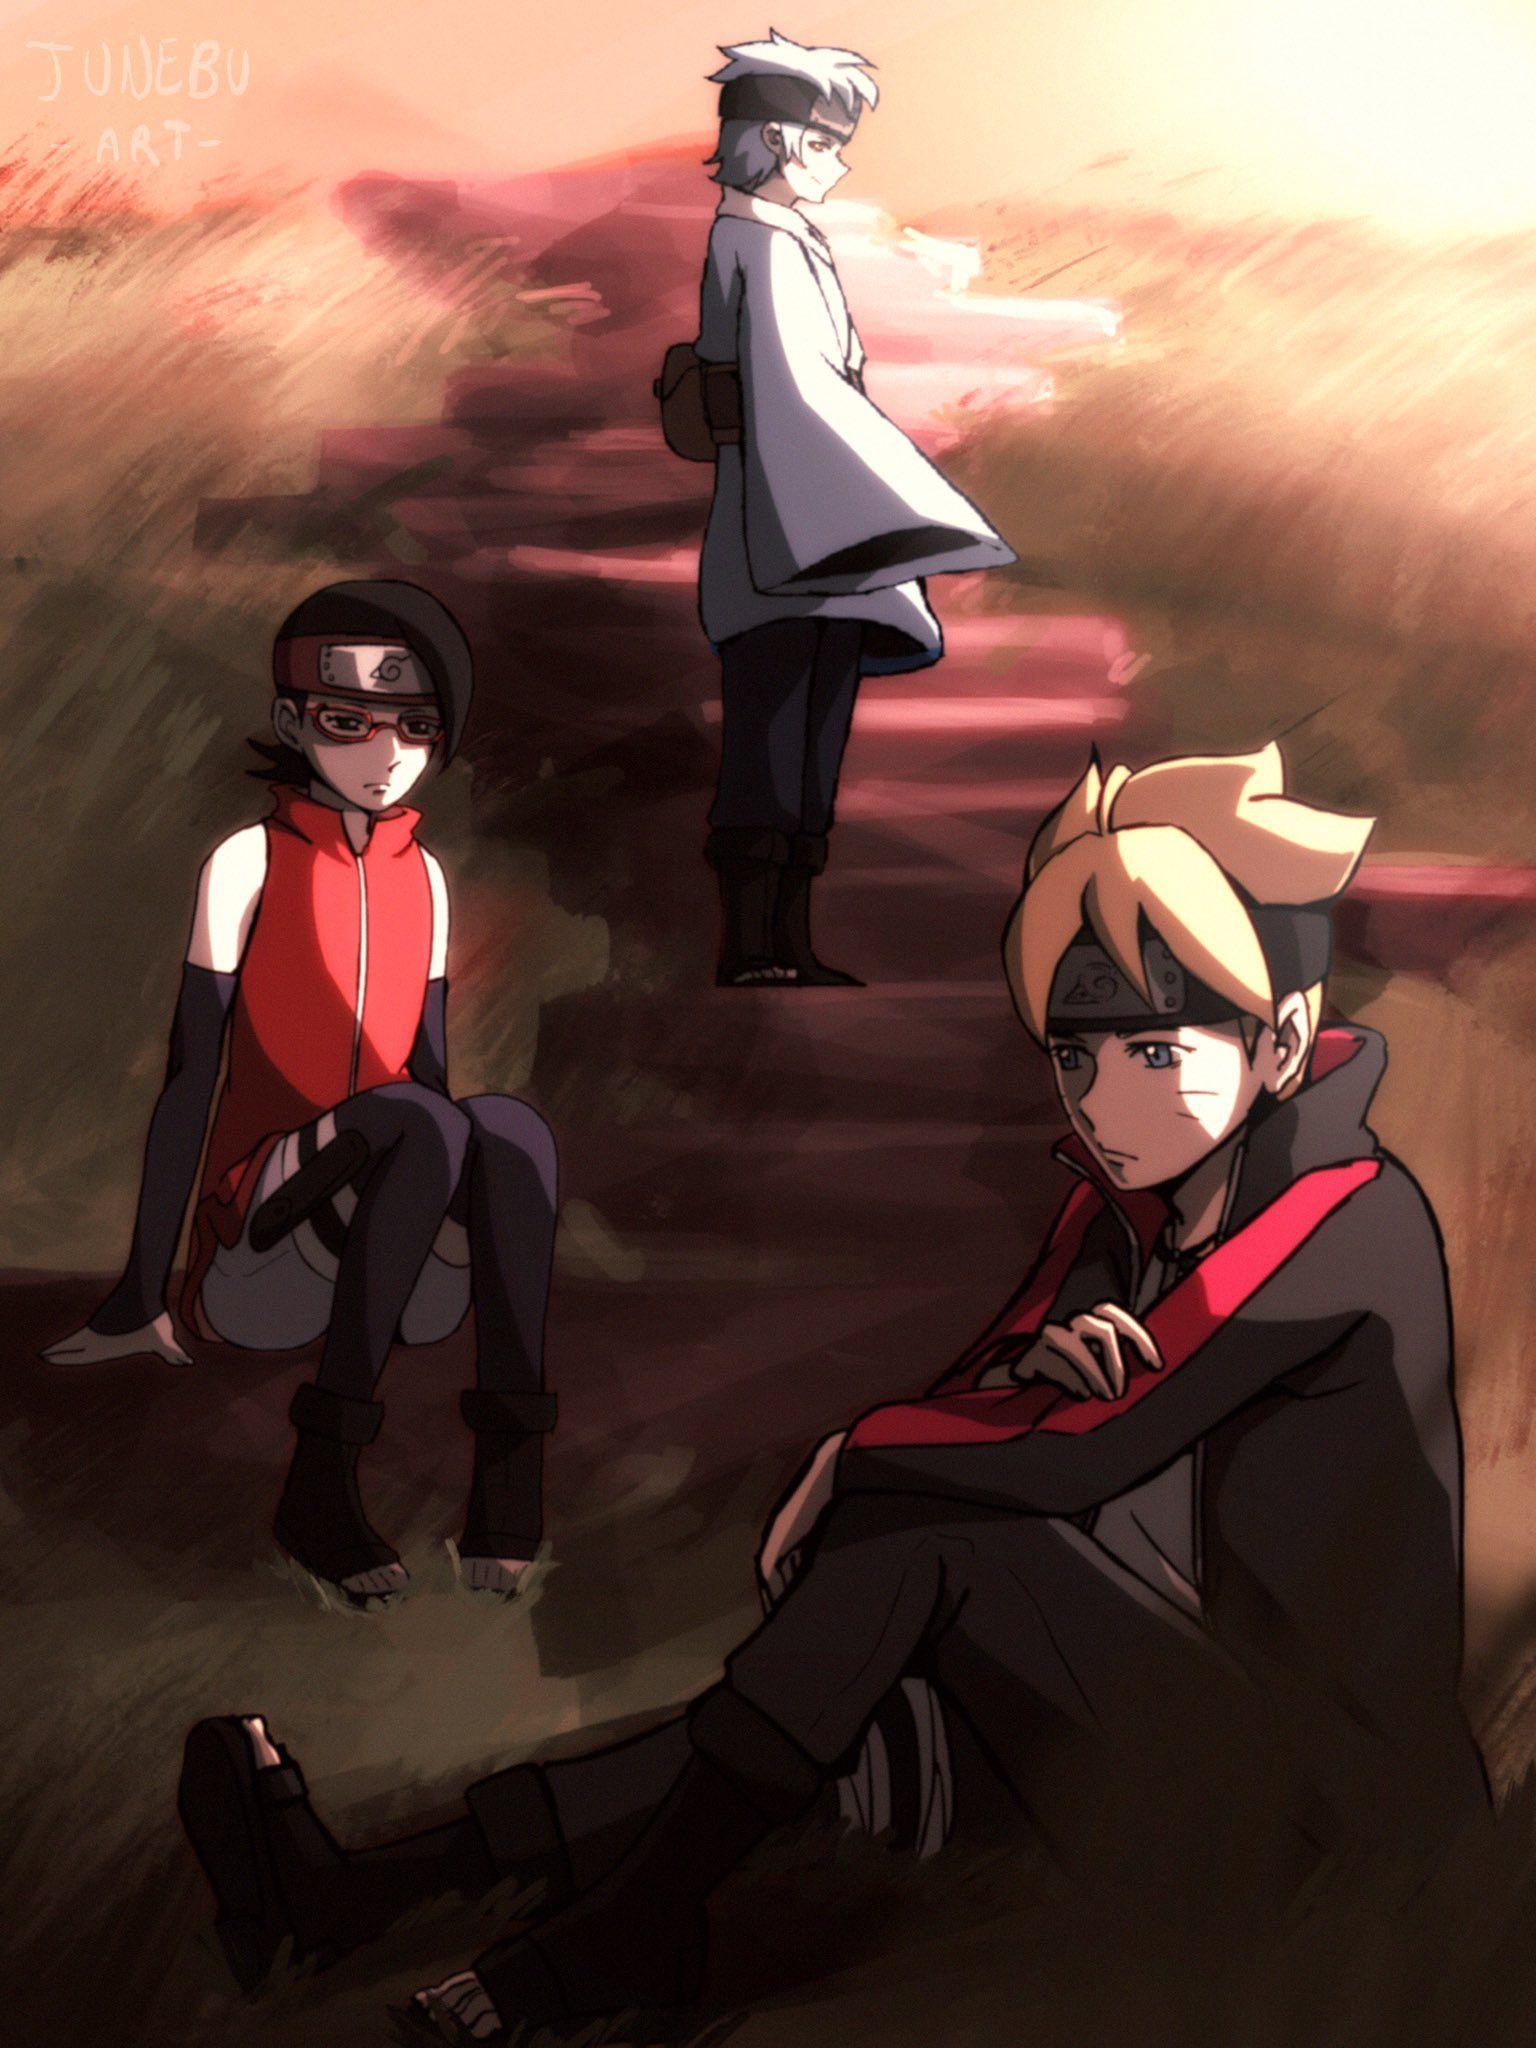 Sunset Anime naruto, Anime, Naruto